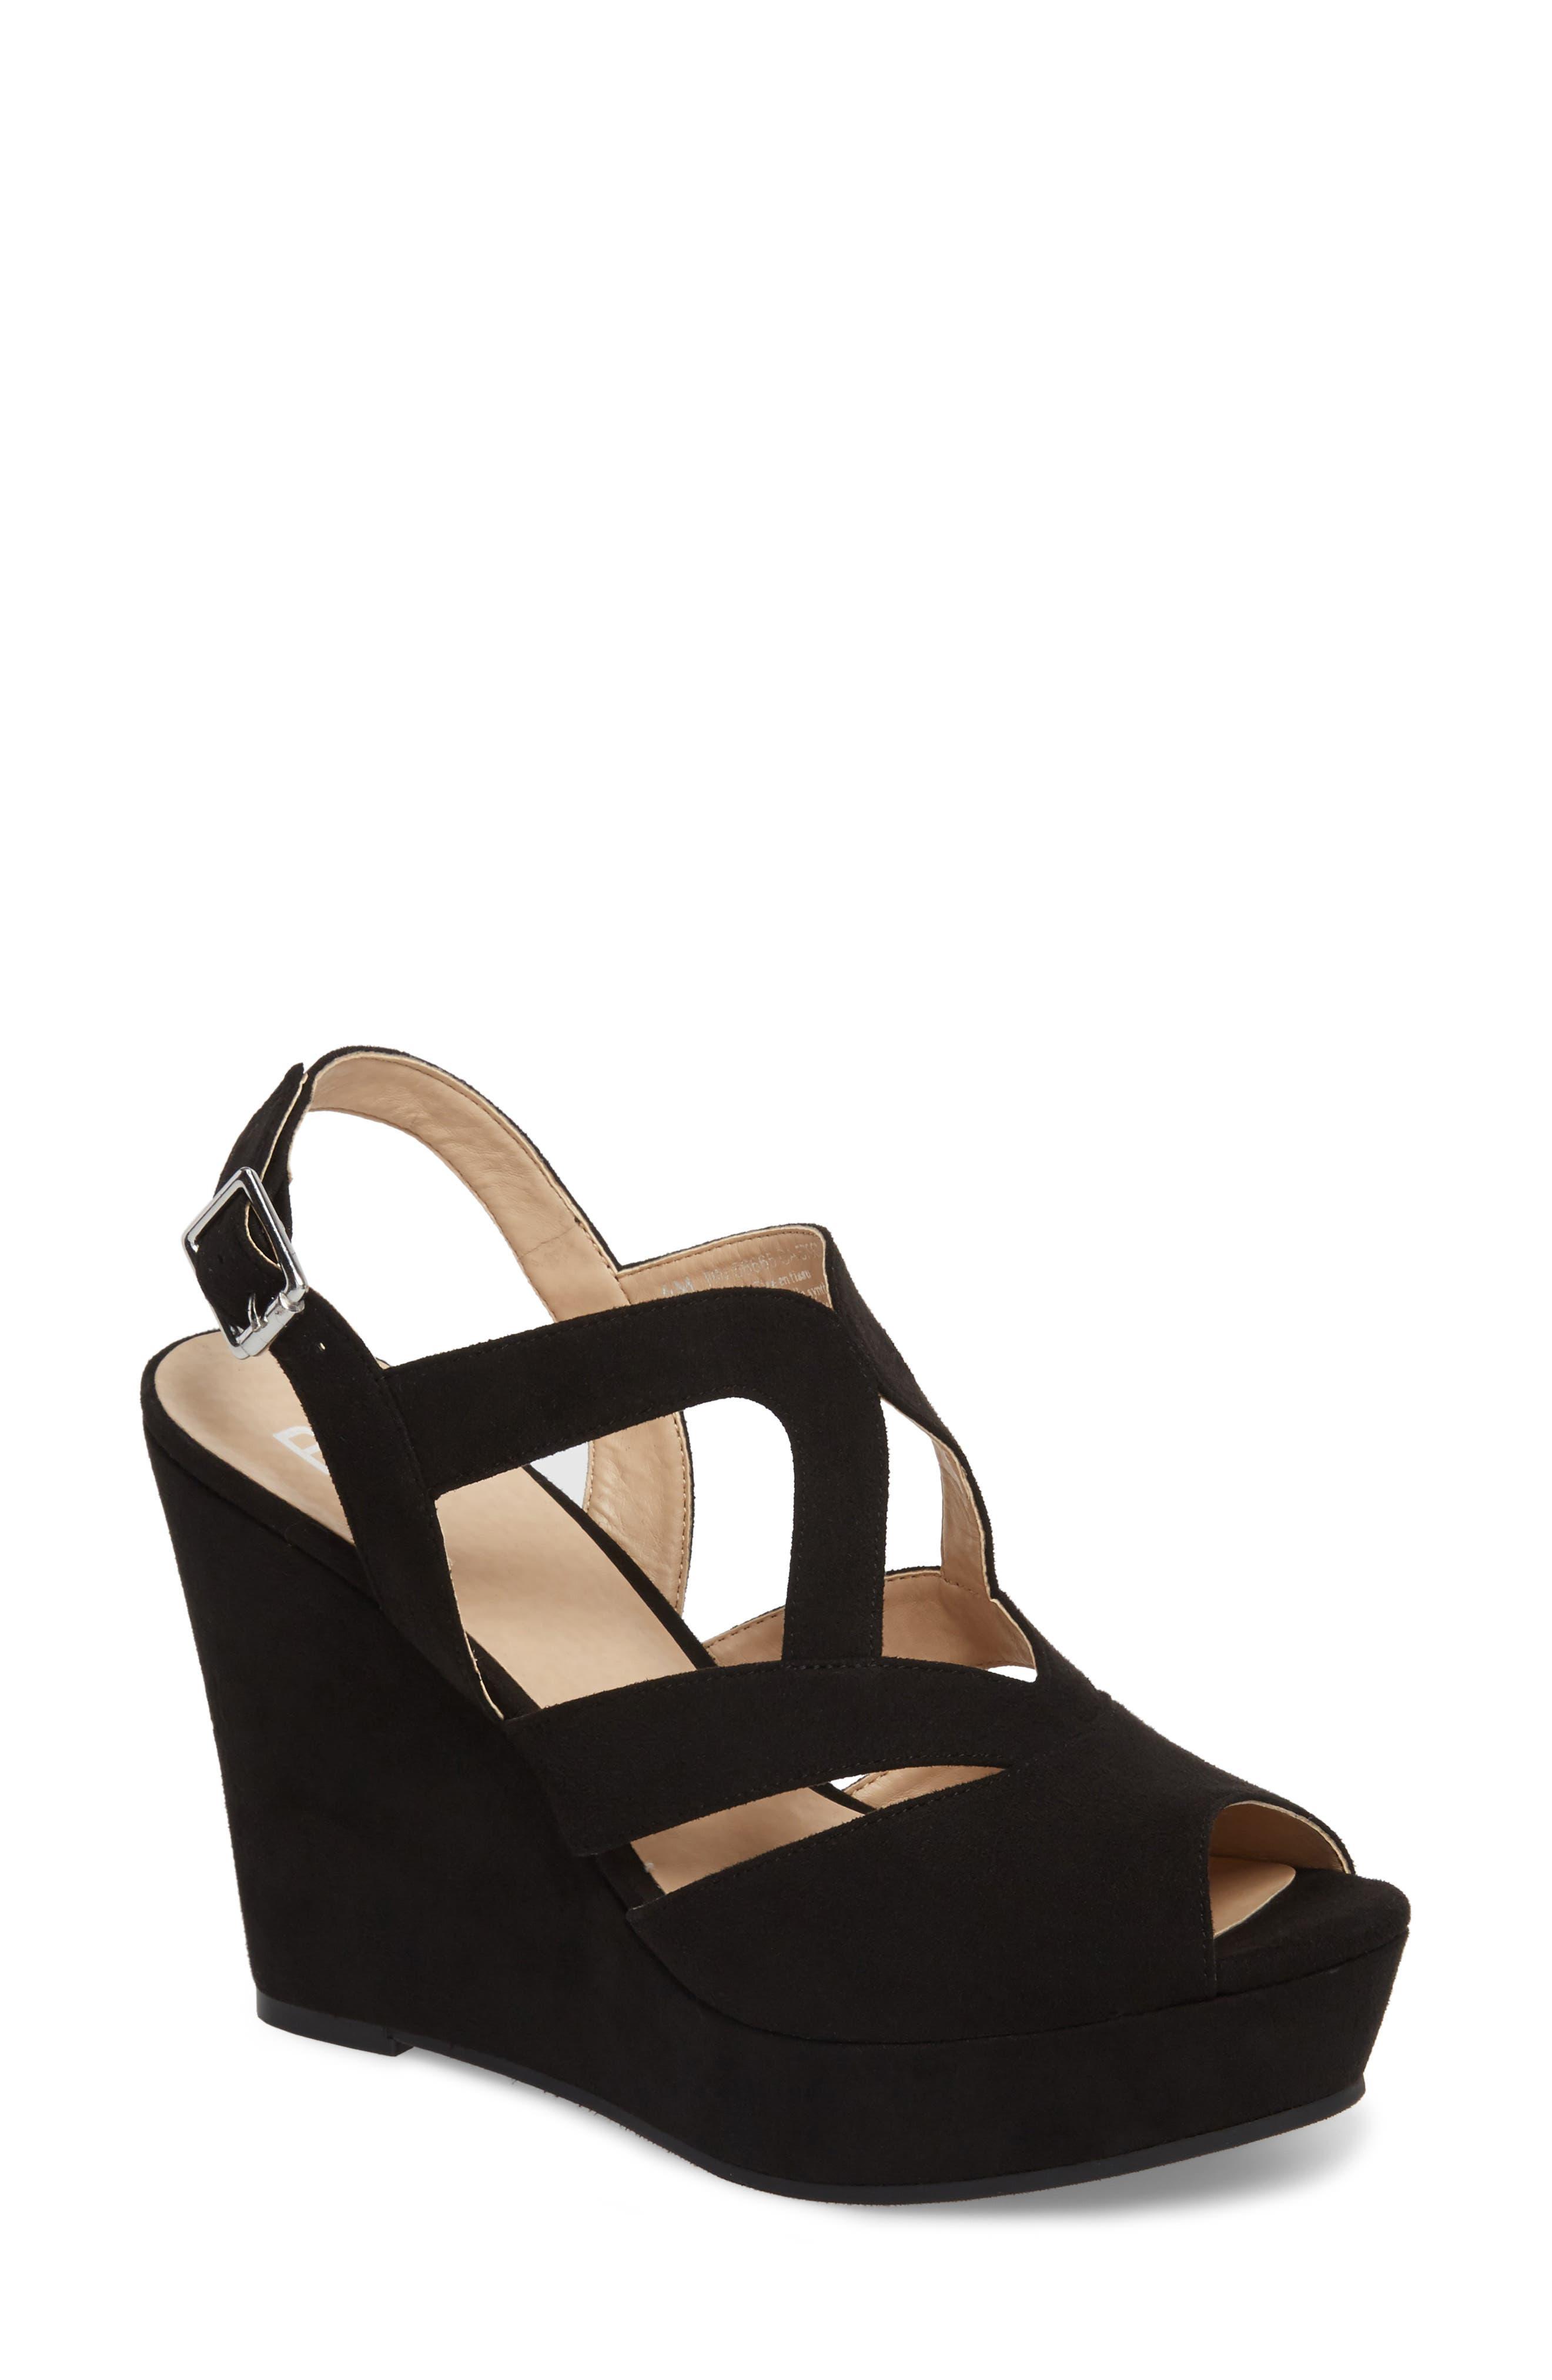 Sunny Platform Wedge Sandal,                             Main thumbnail 1, color,